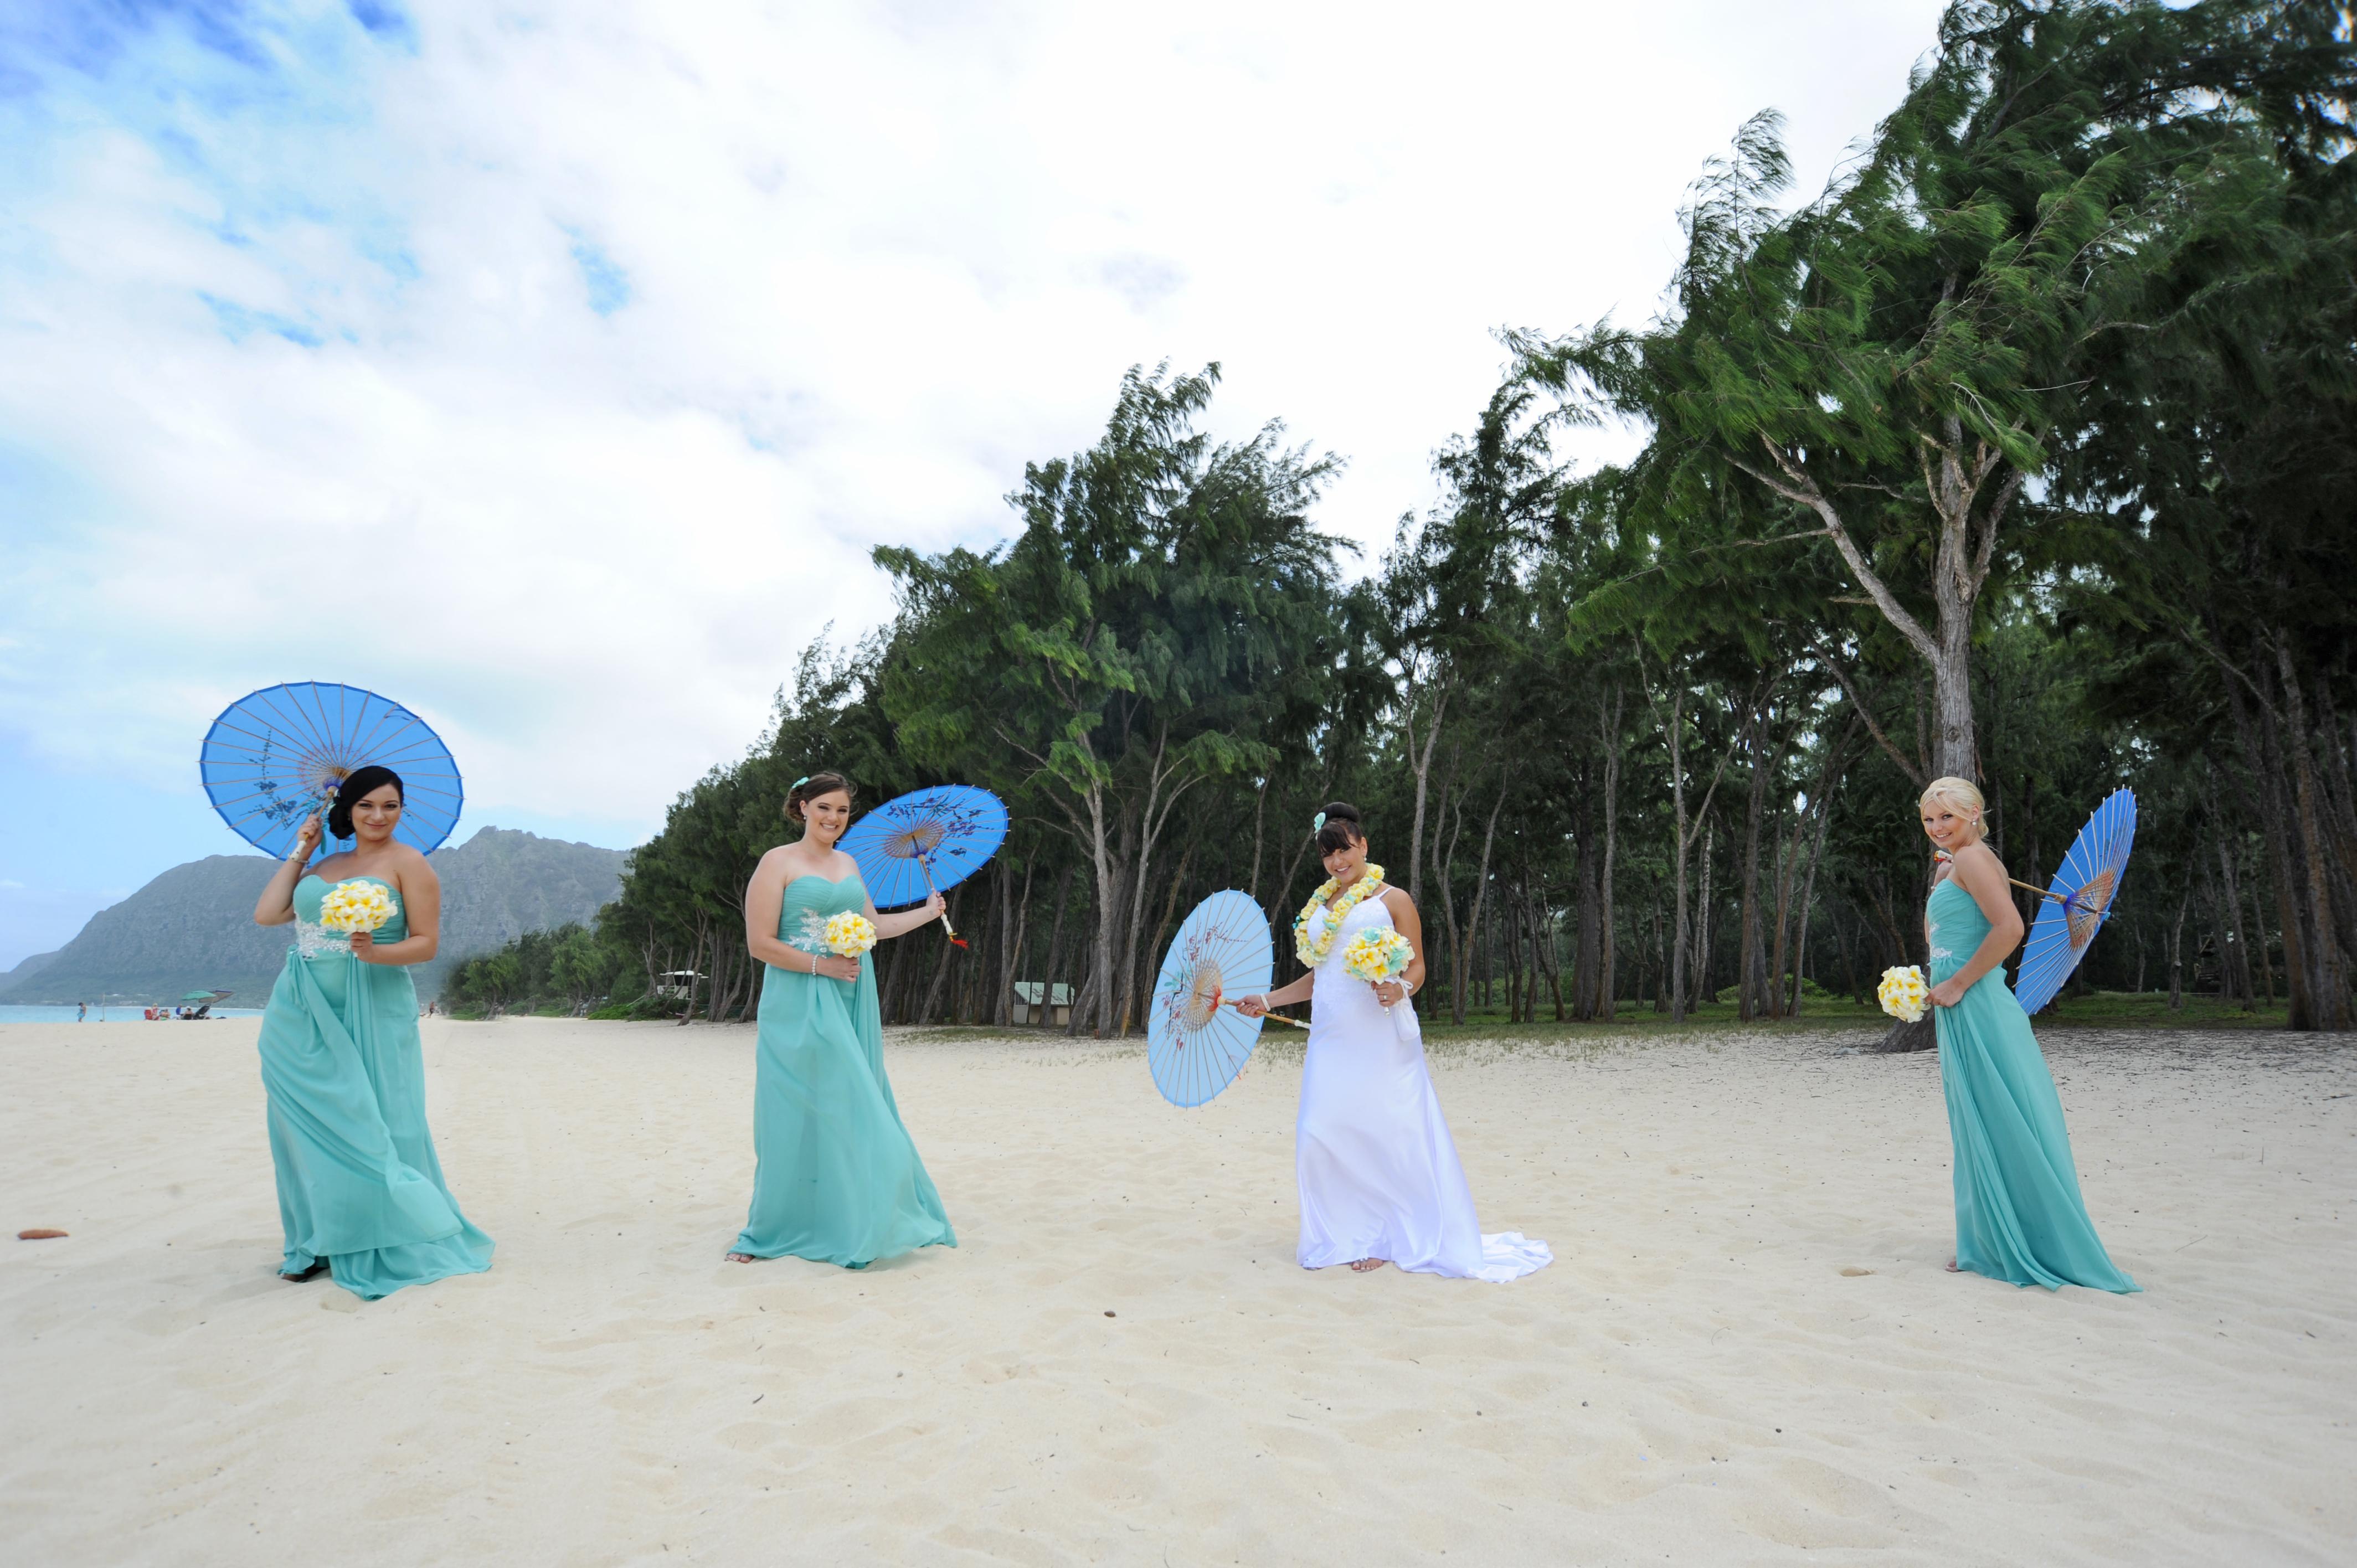 Alohaislandweddings.com- Wedding Picture in Hawaii-8